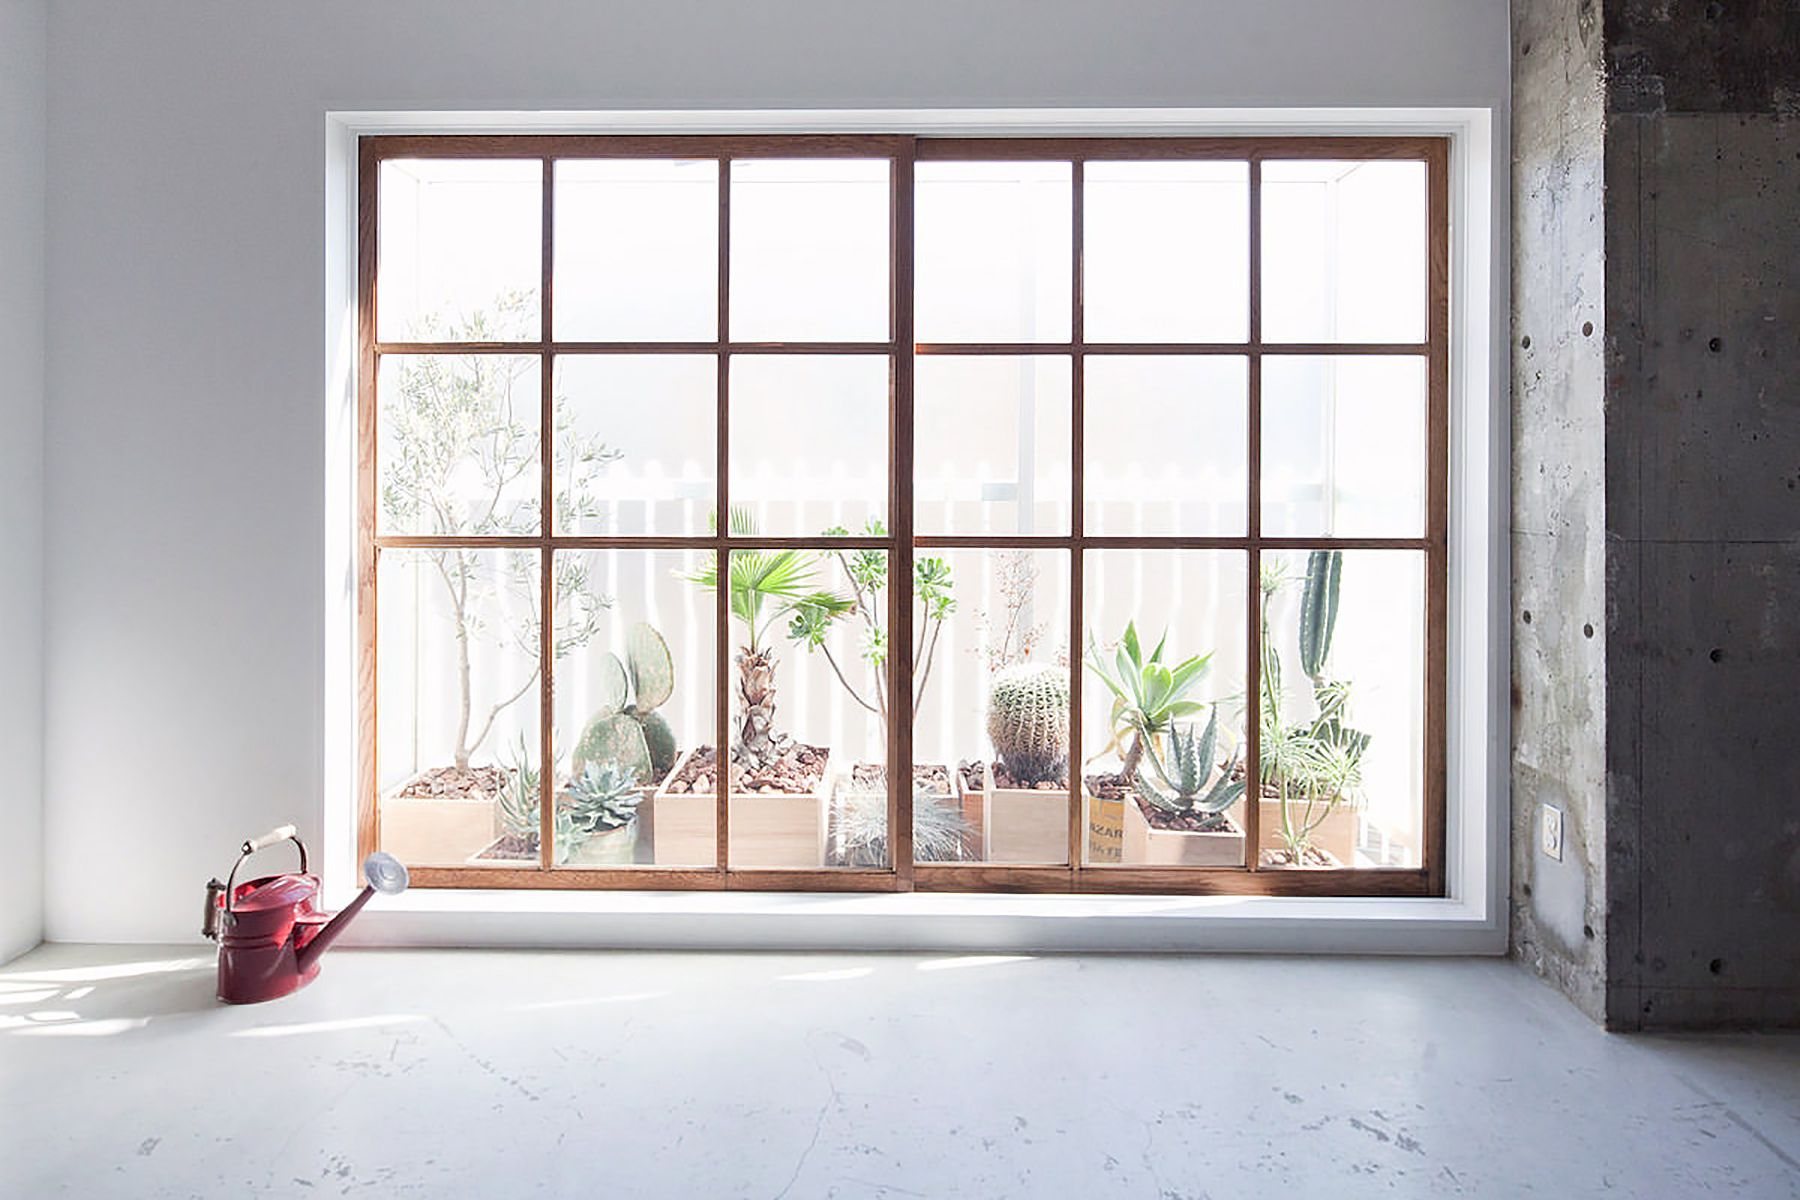 RE studio (アールイースタジオ)窓の方角:東